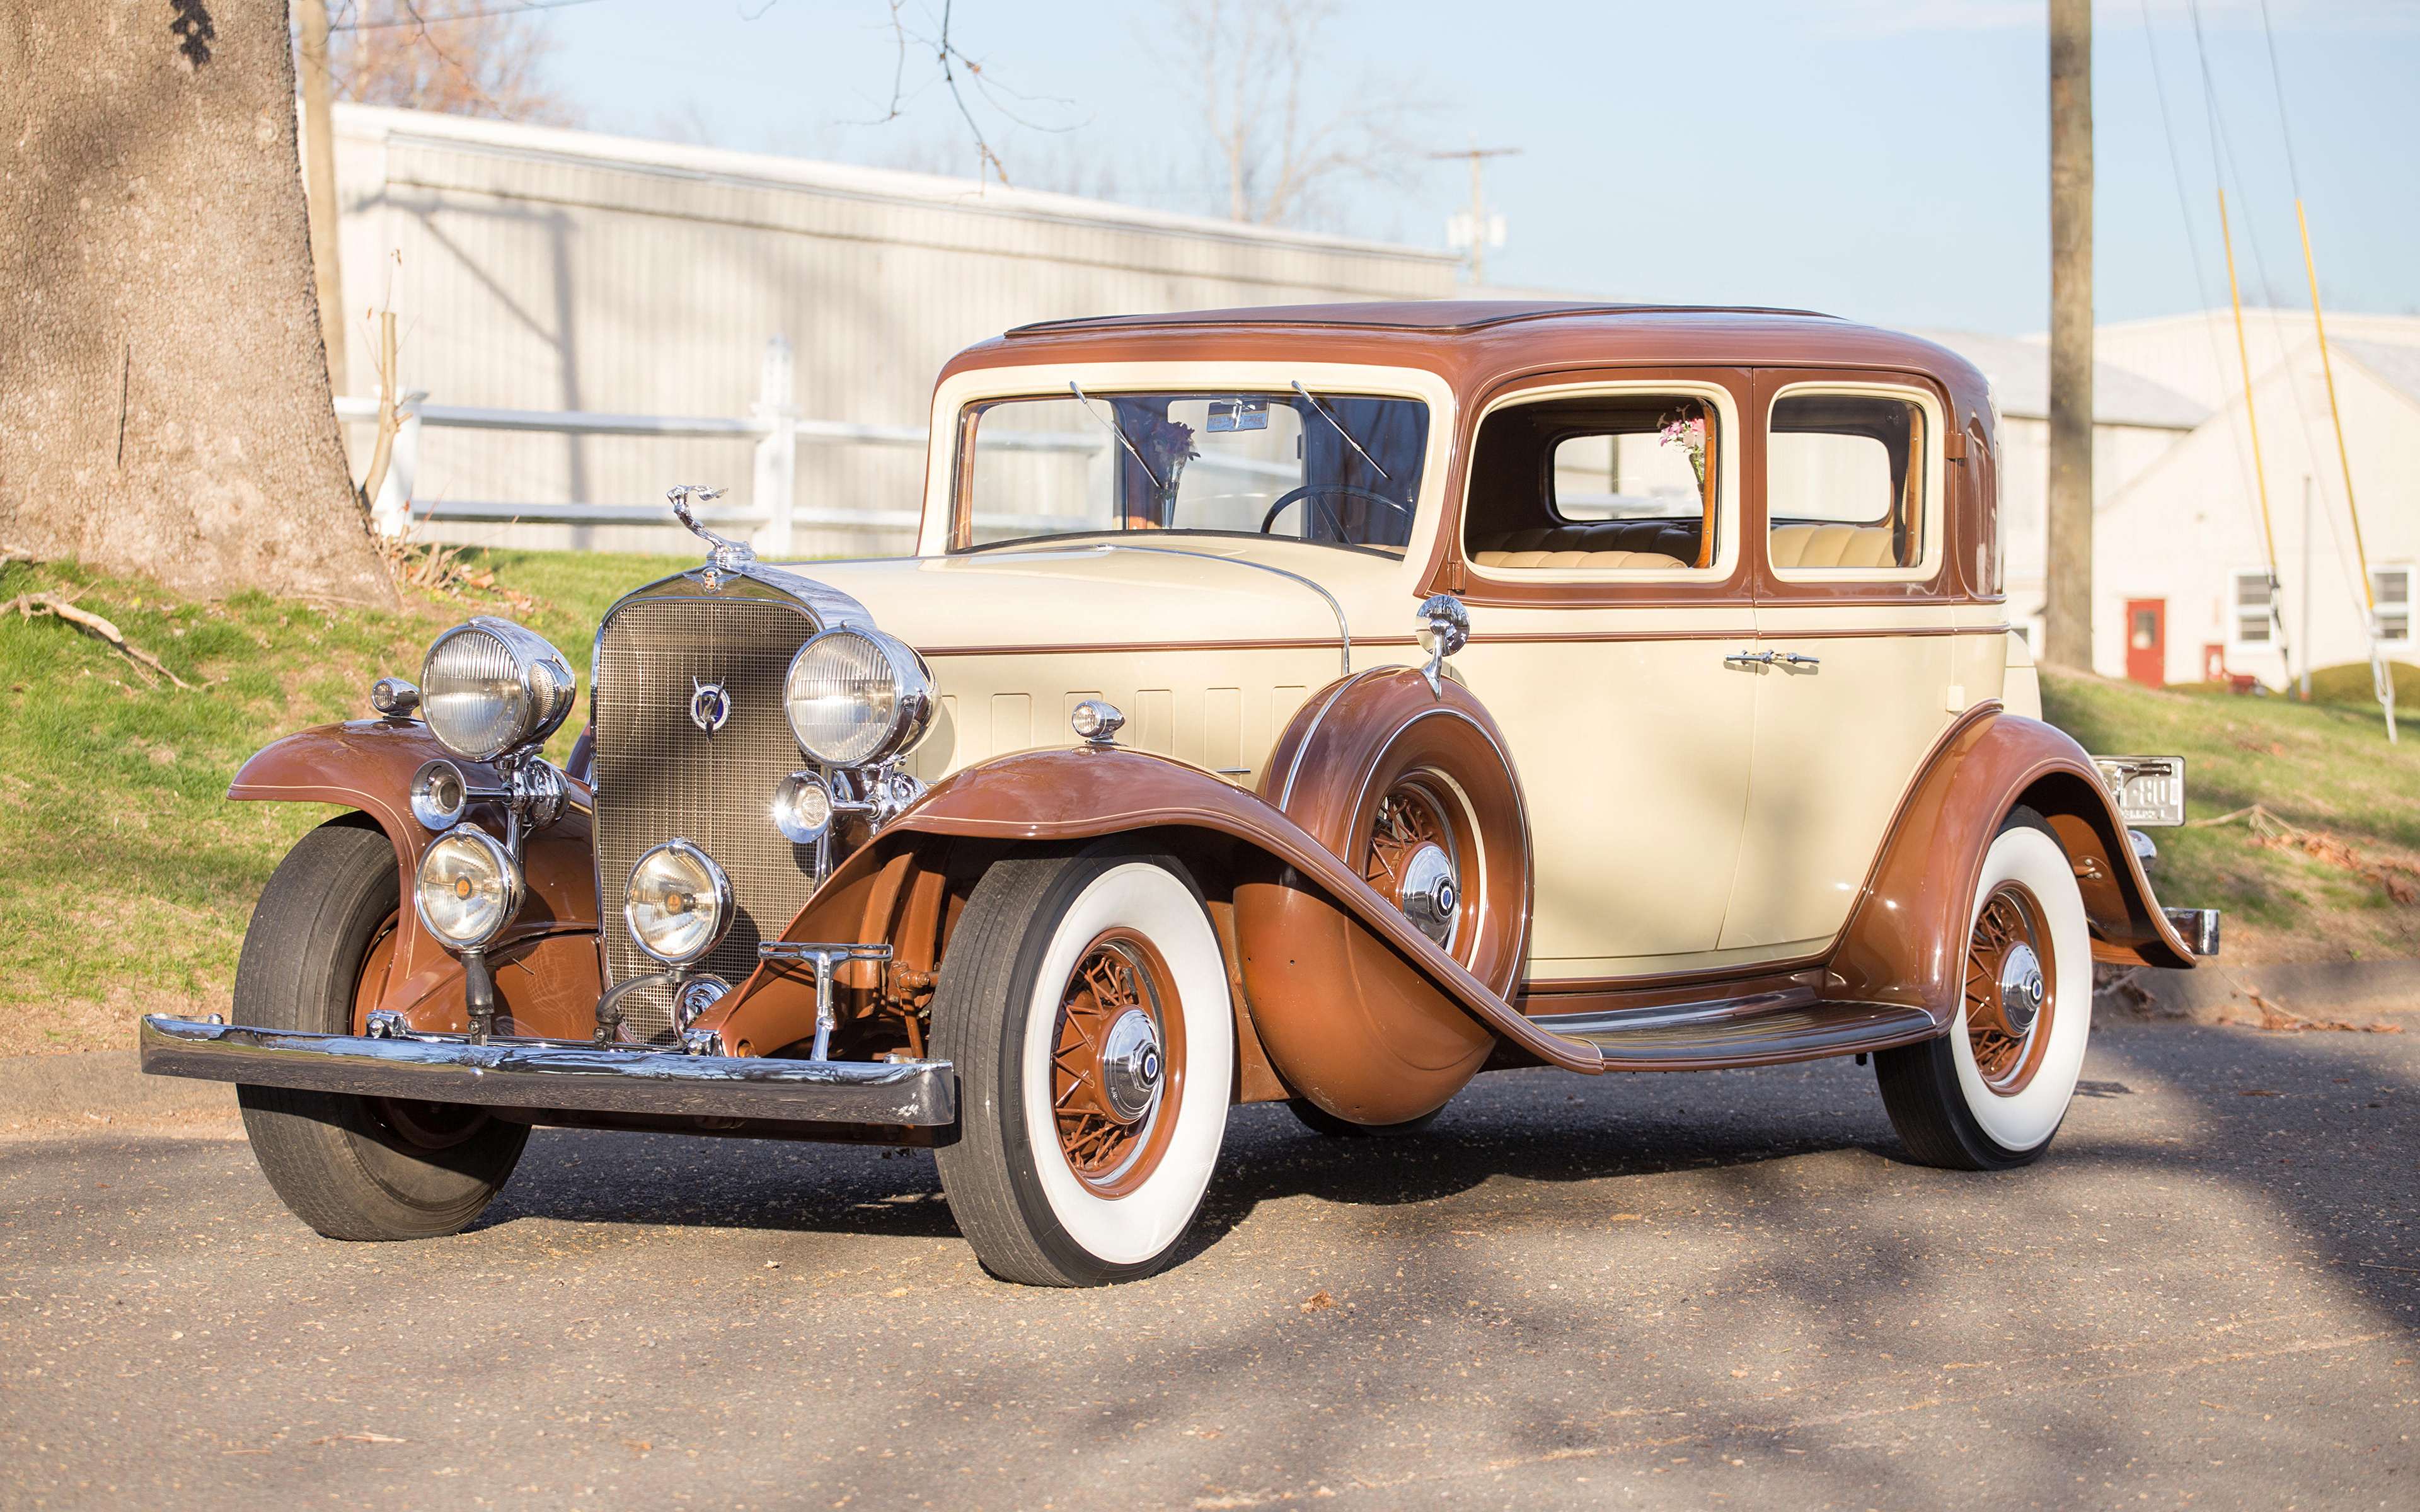 Фото Кадиллак 1932 V12 370-B Town Sedan by Fisher авто 3840x2400 Cadillac машина машины Автомобили автомобиль